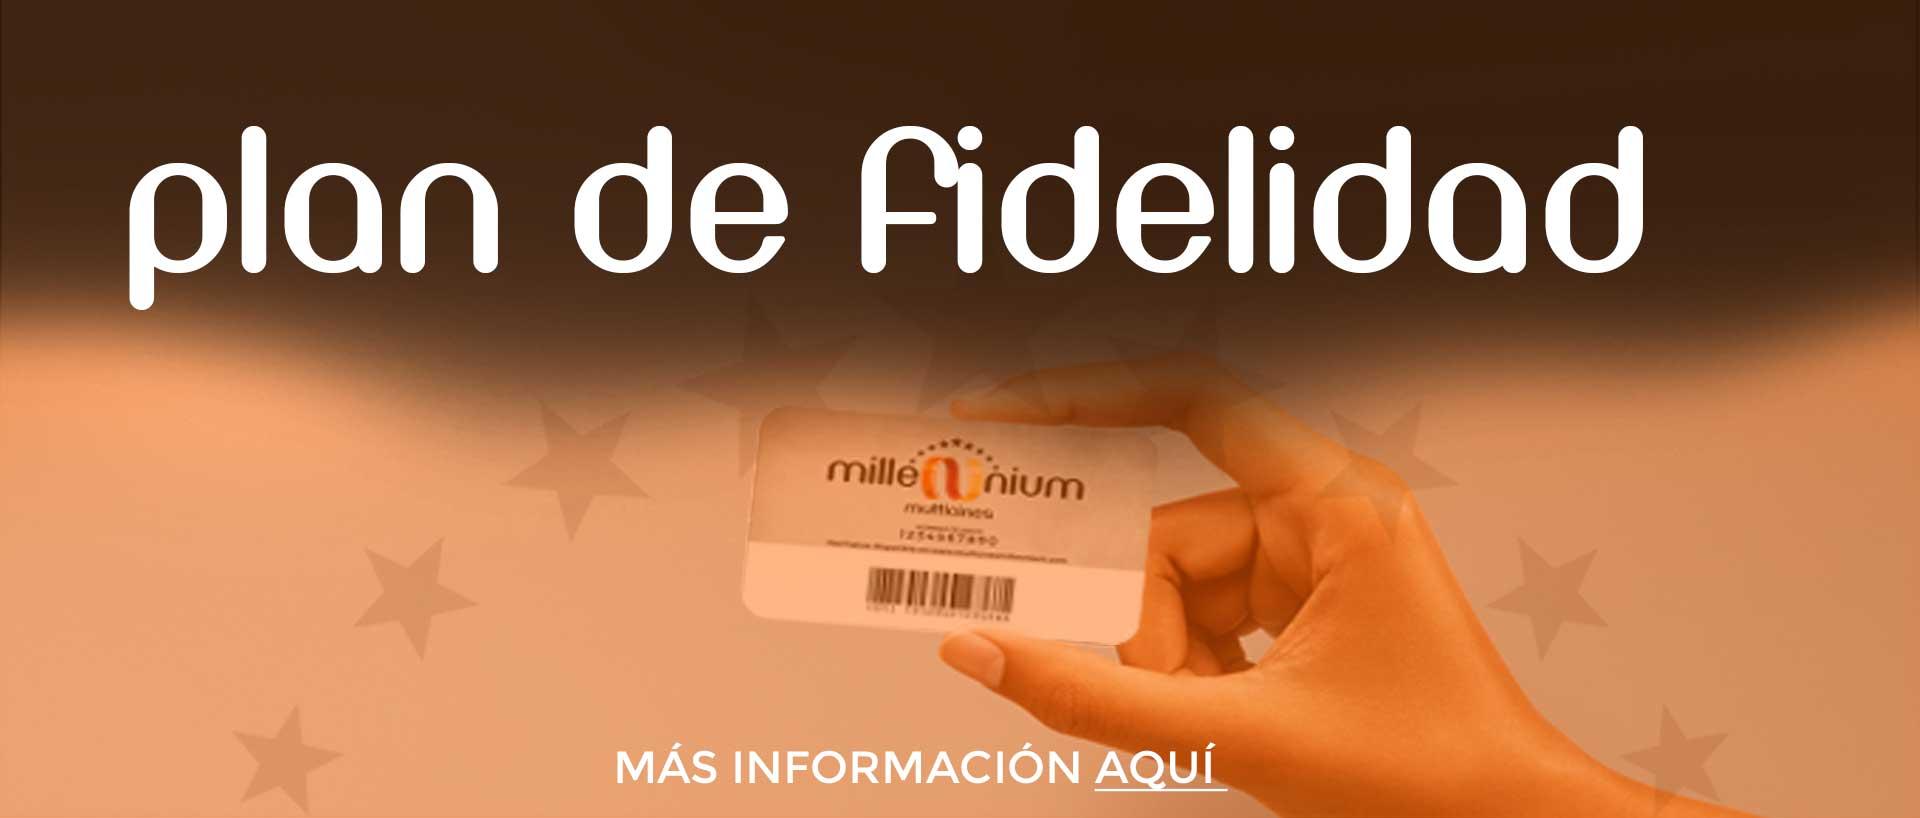 Promo-Fidelidad-1920x818.jpg